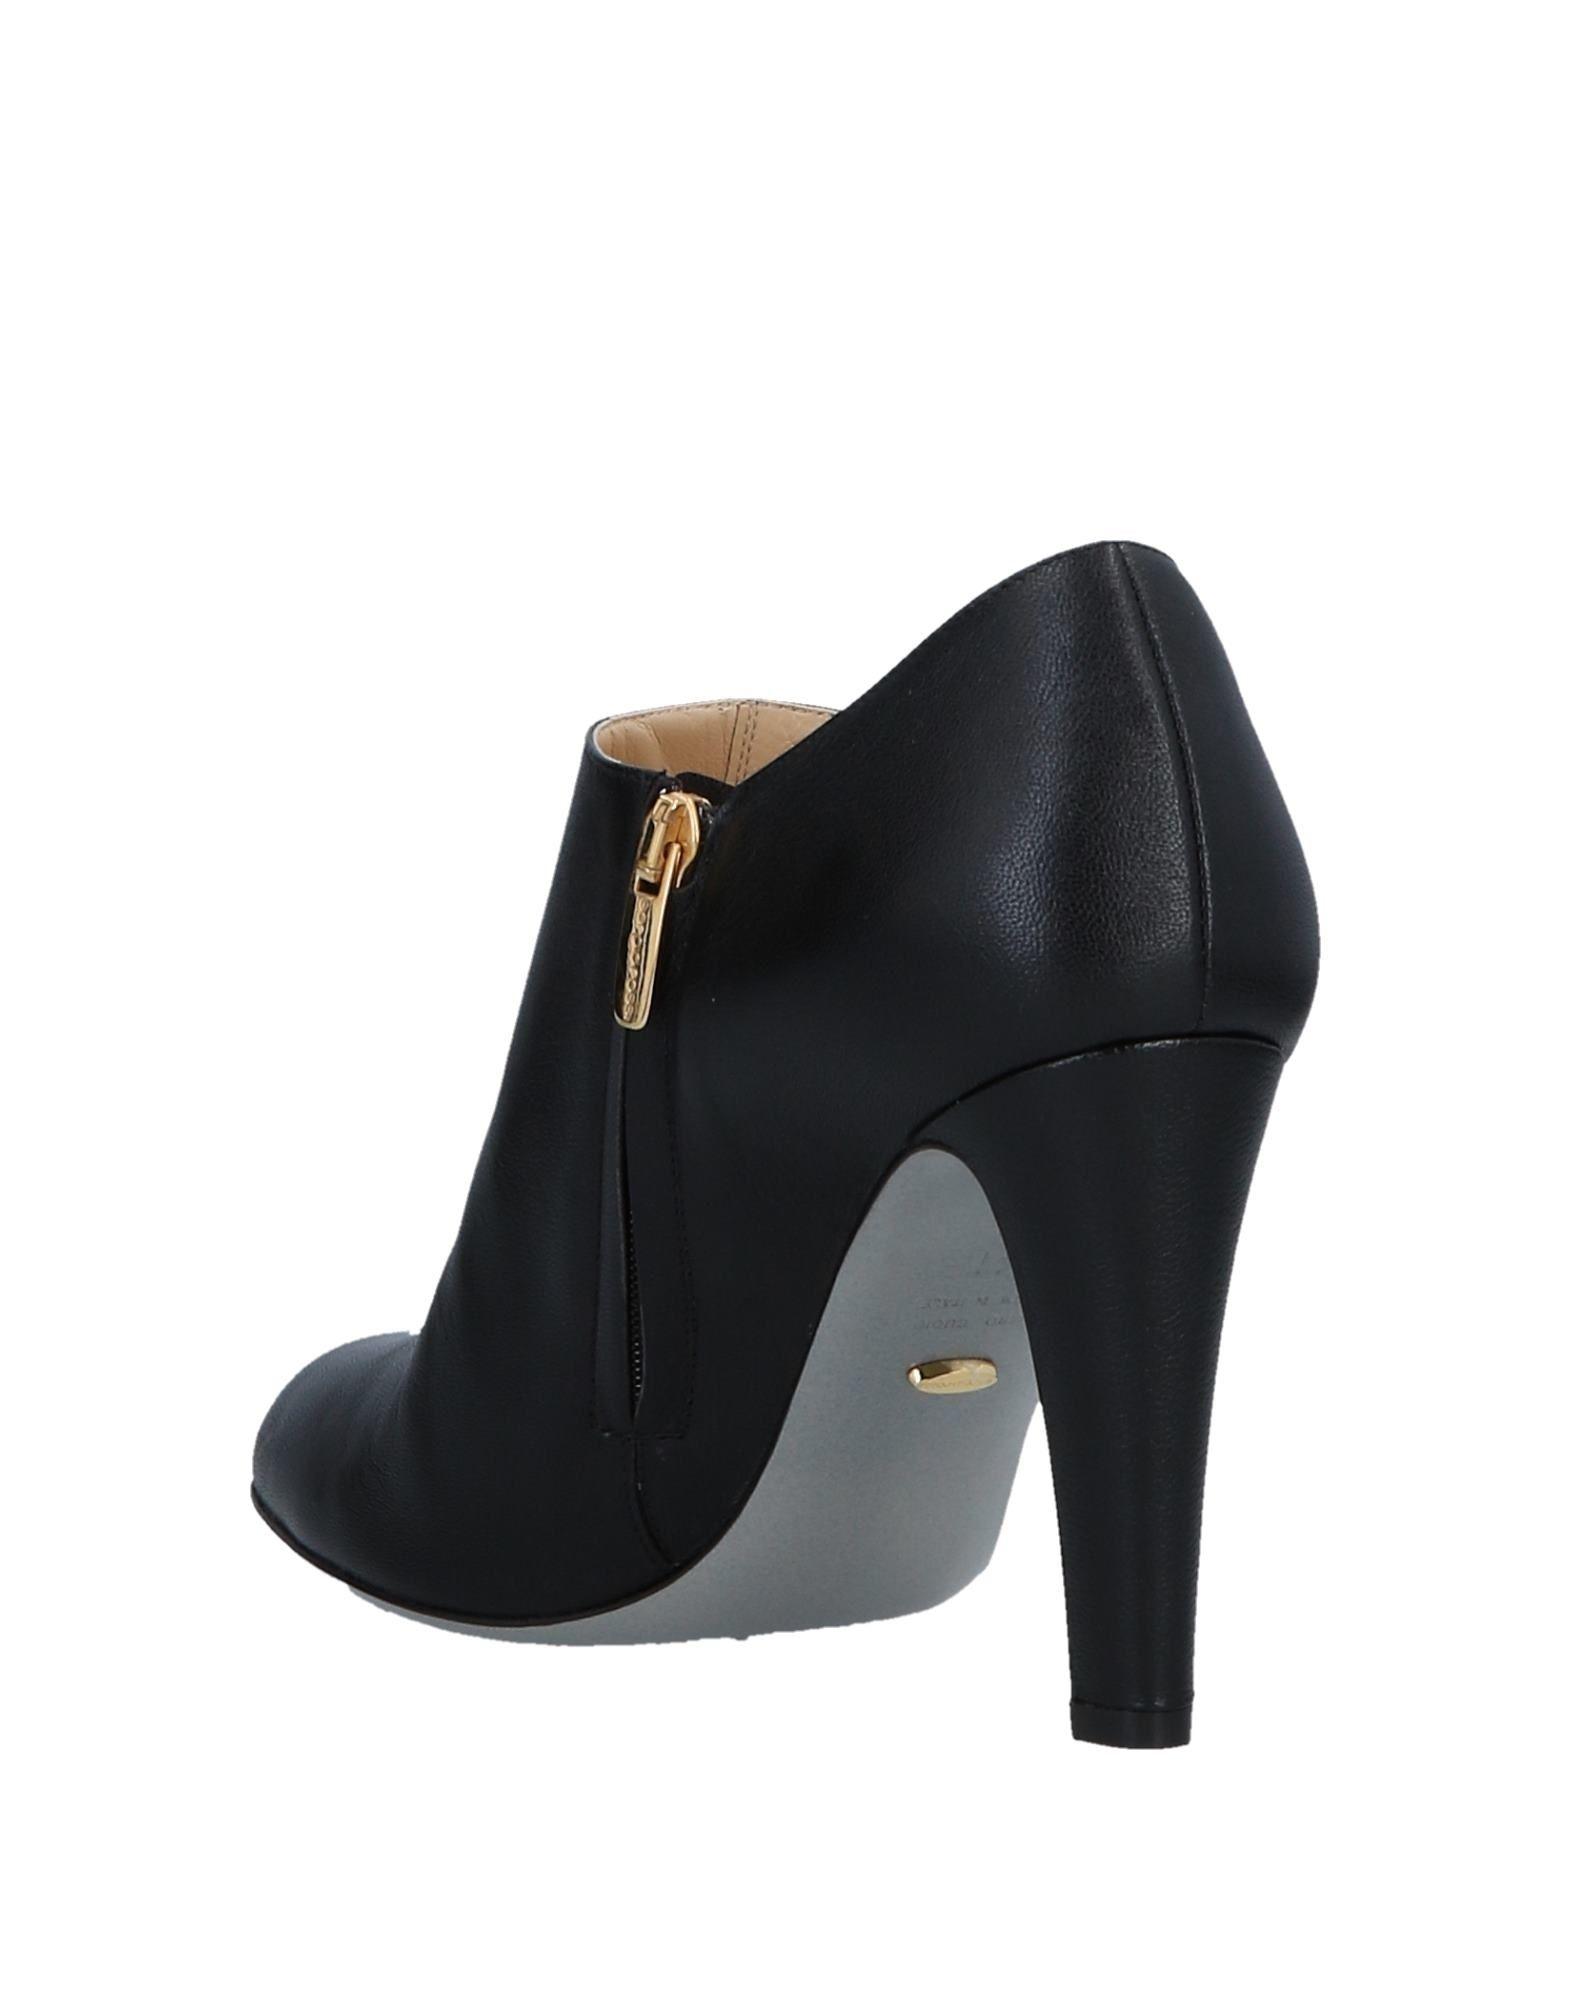 Sergio Rossi  Stiefelette Damen  Rossi 11525925MT Beliebte Schuhe 1fddf5